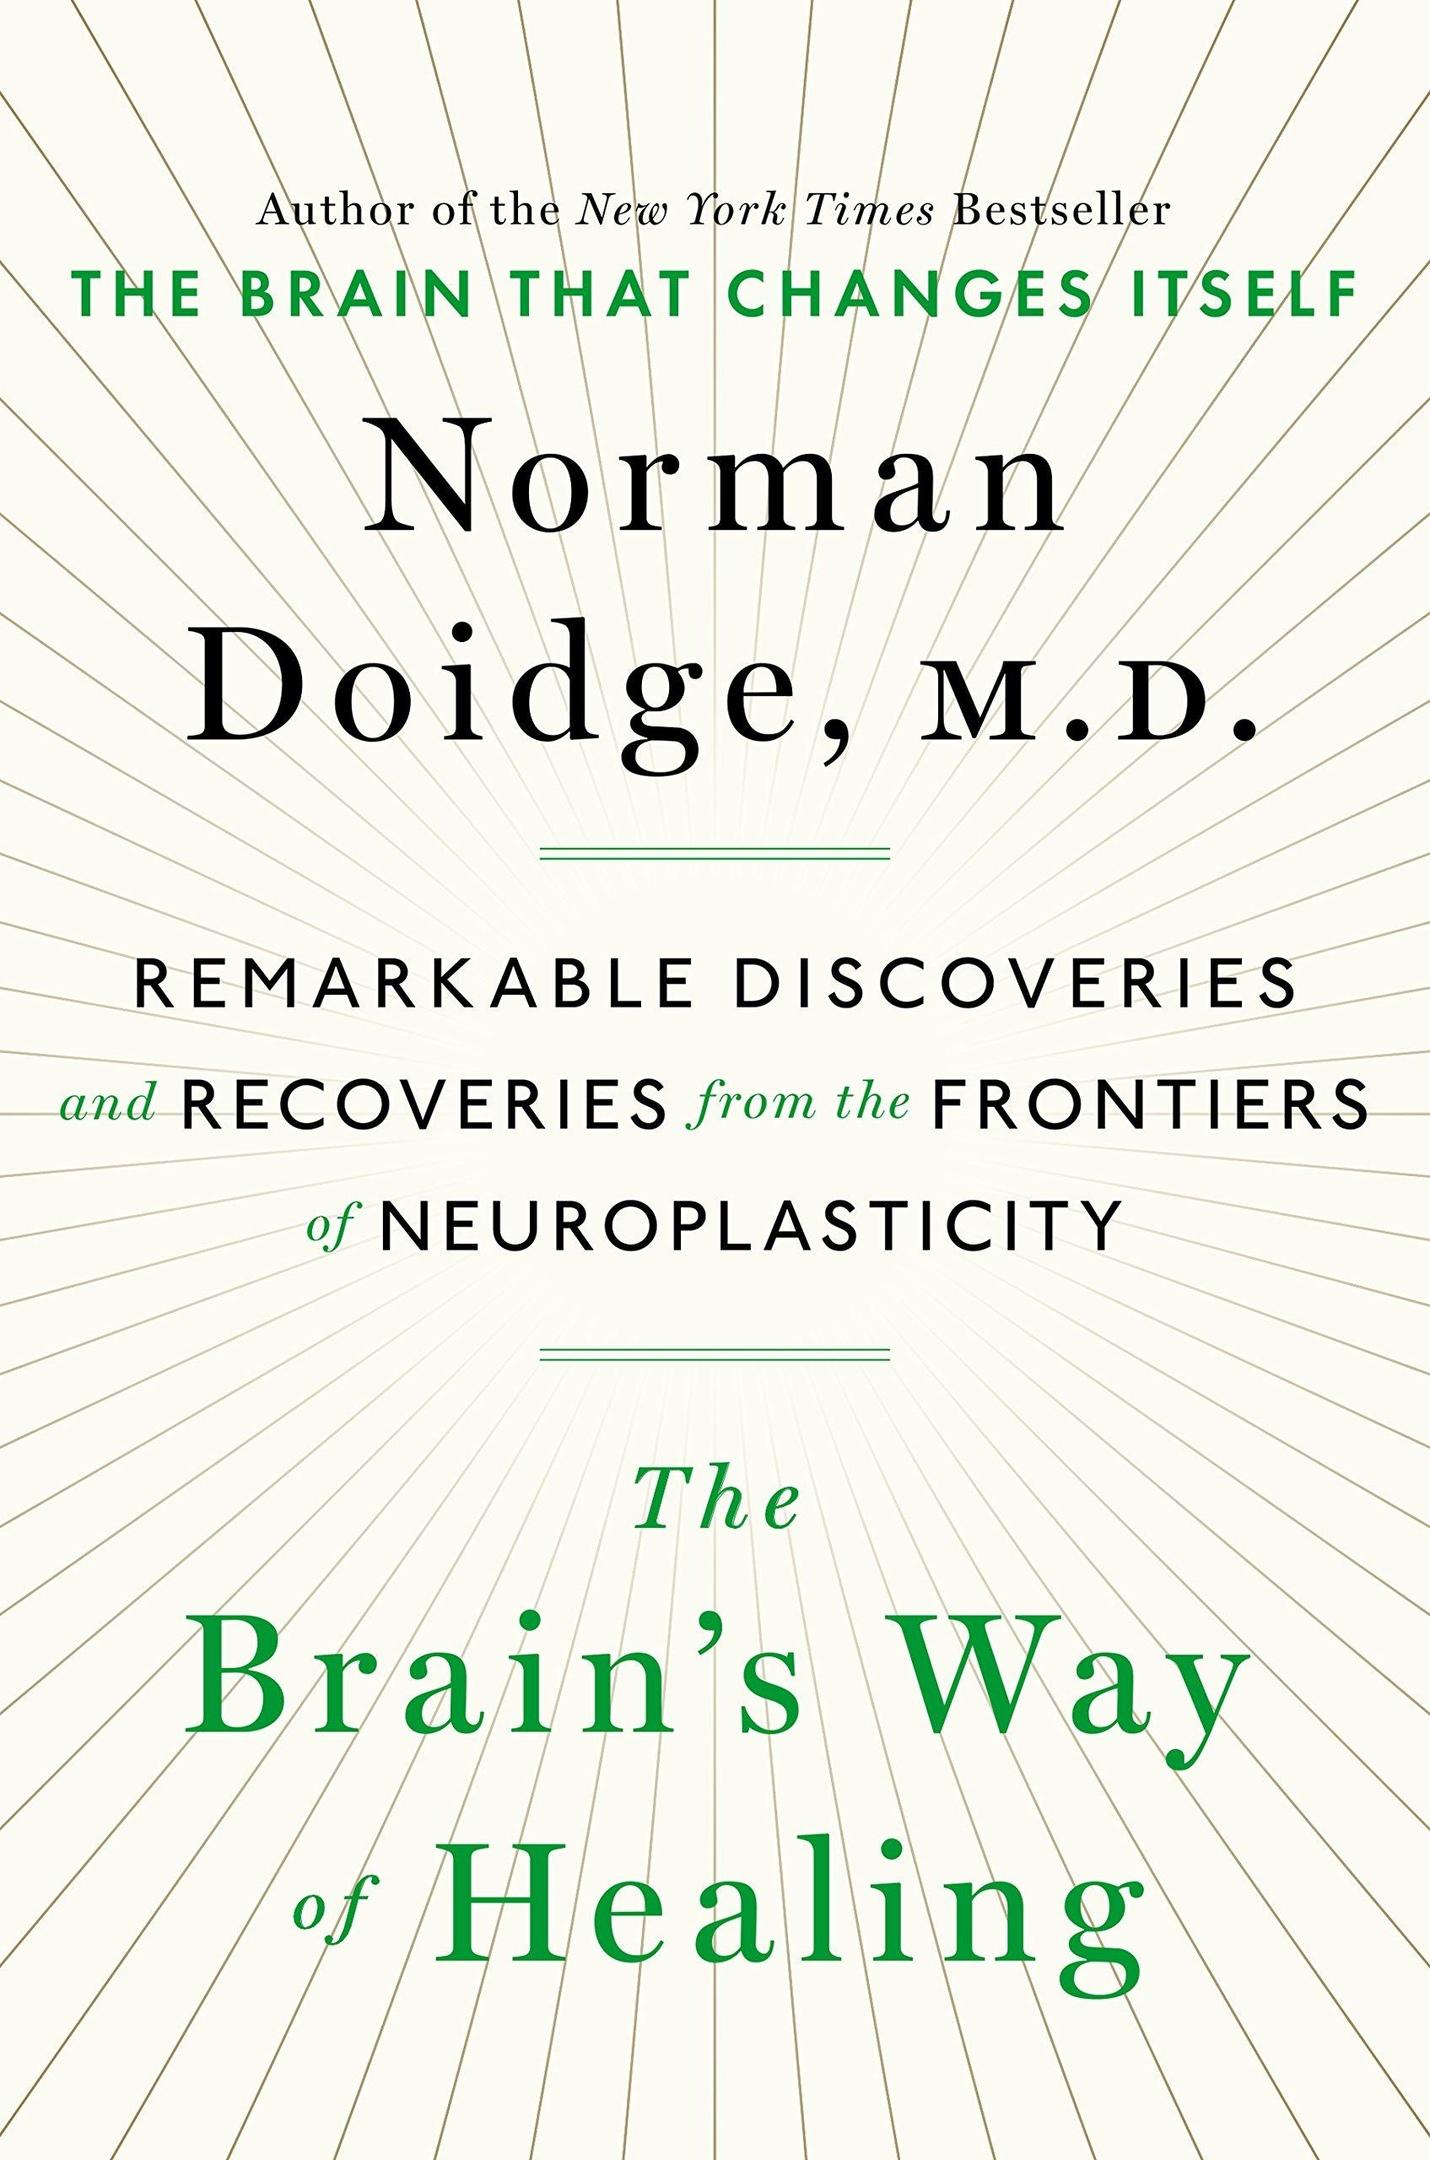 Norman Doidge – The Brain's Way Of Healing